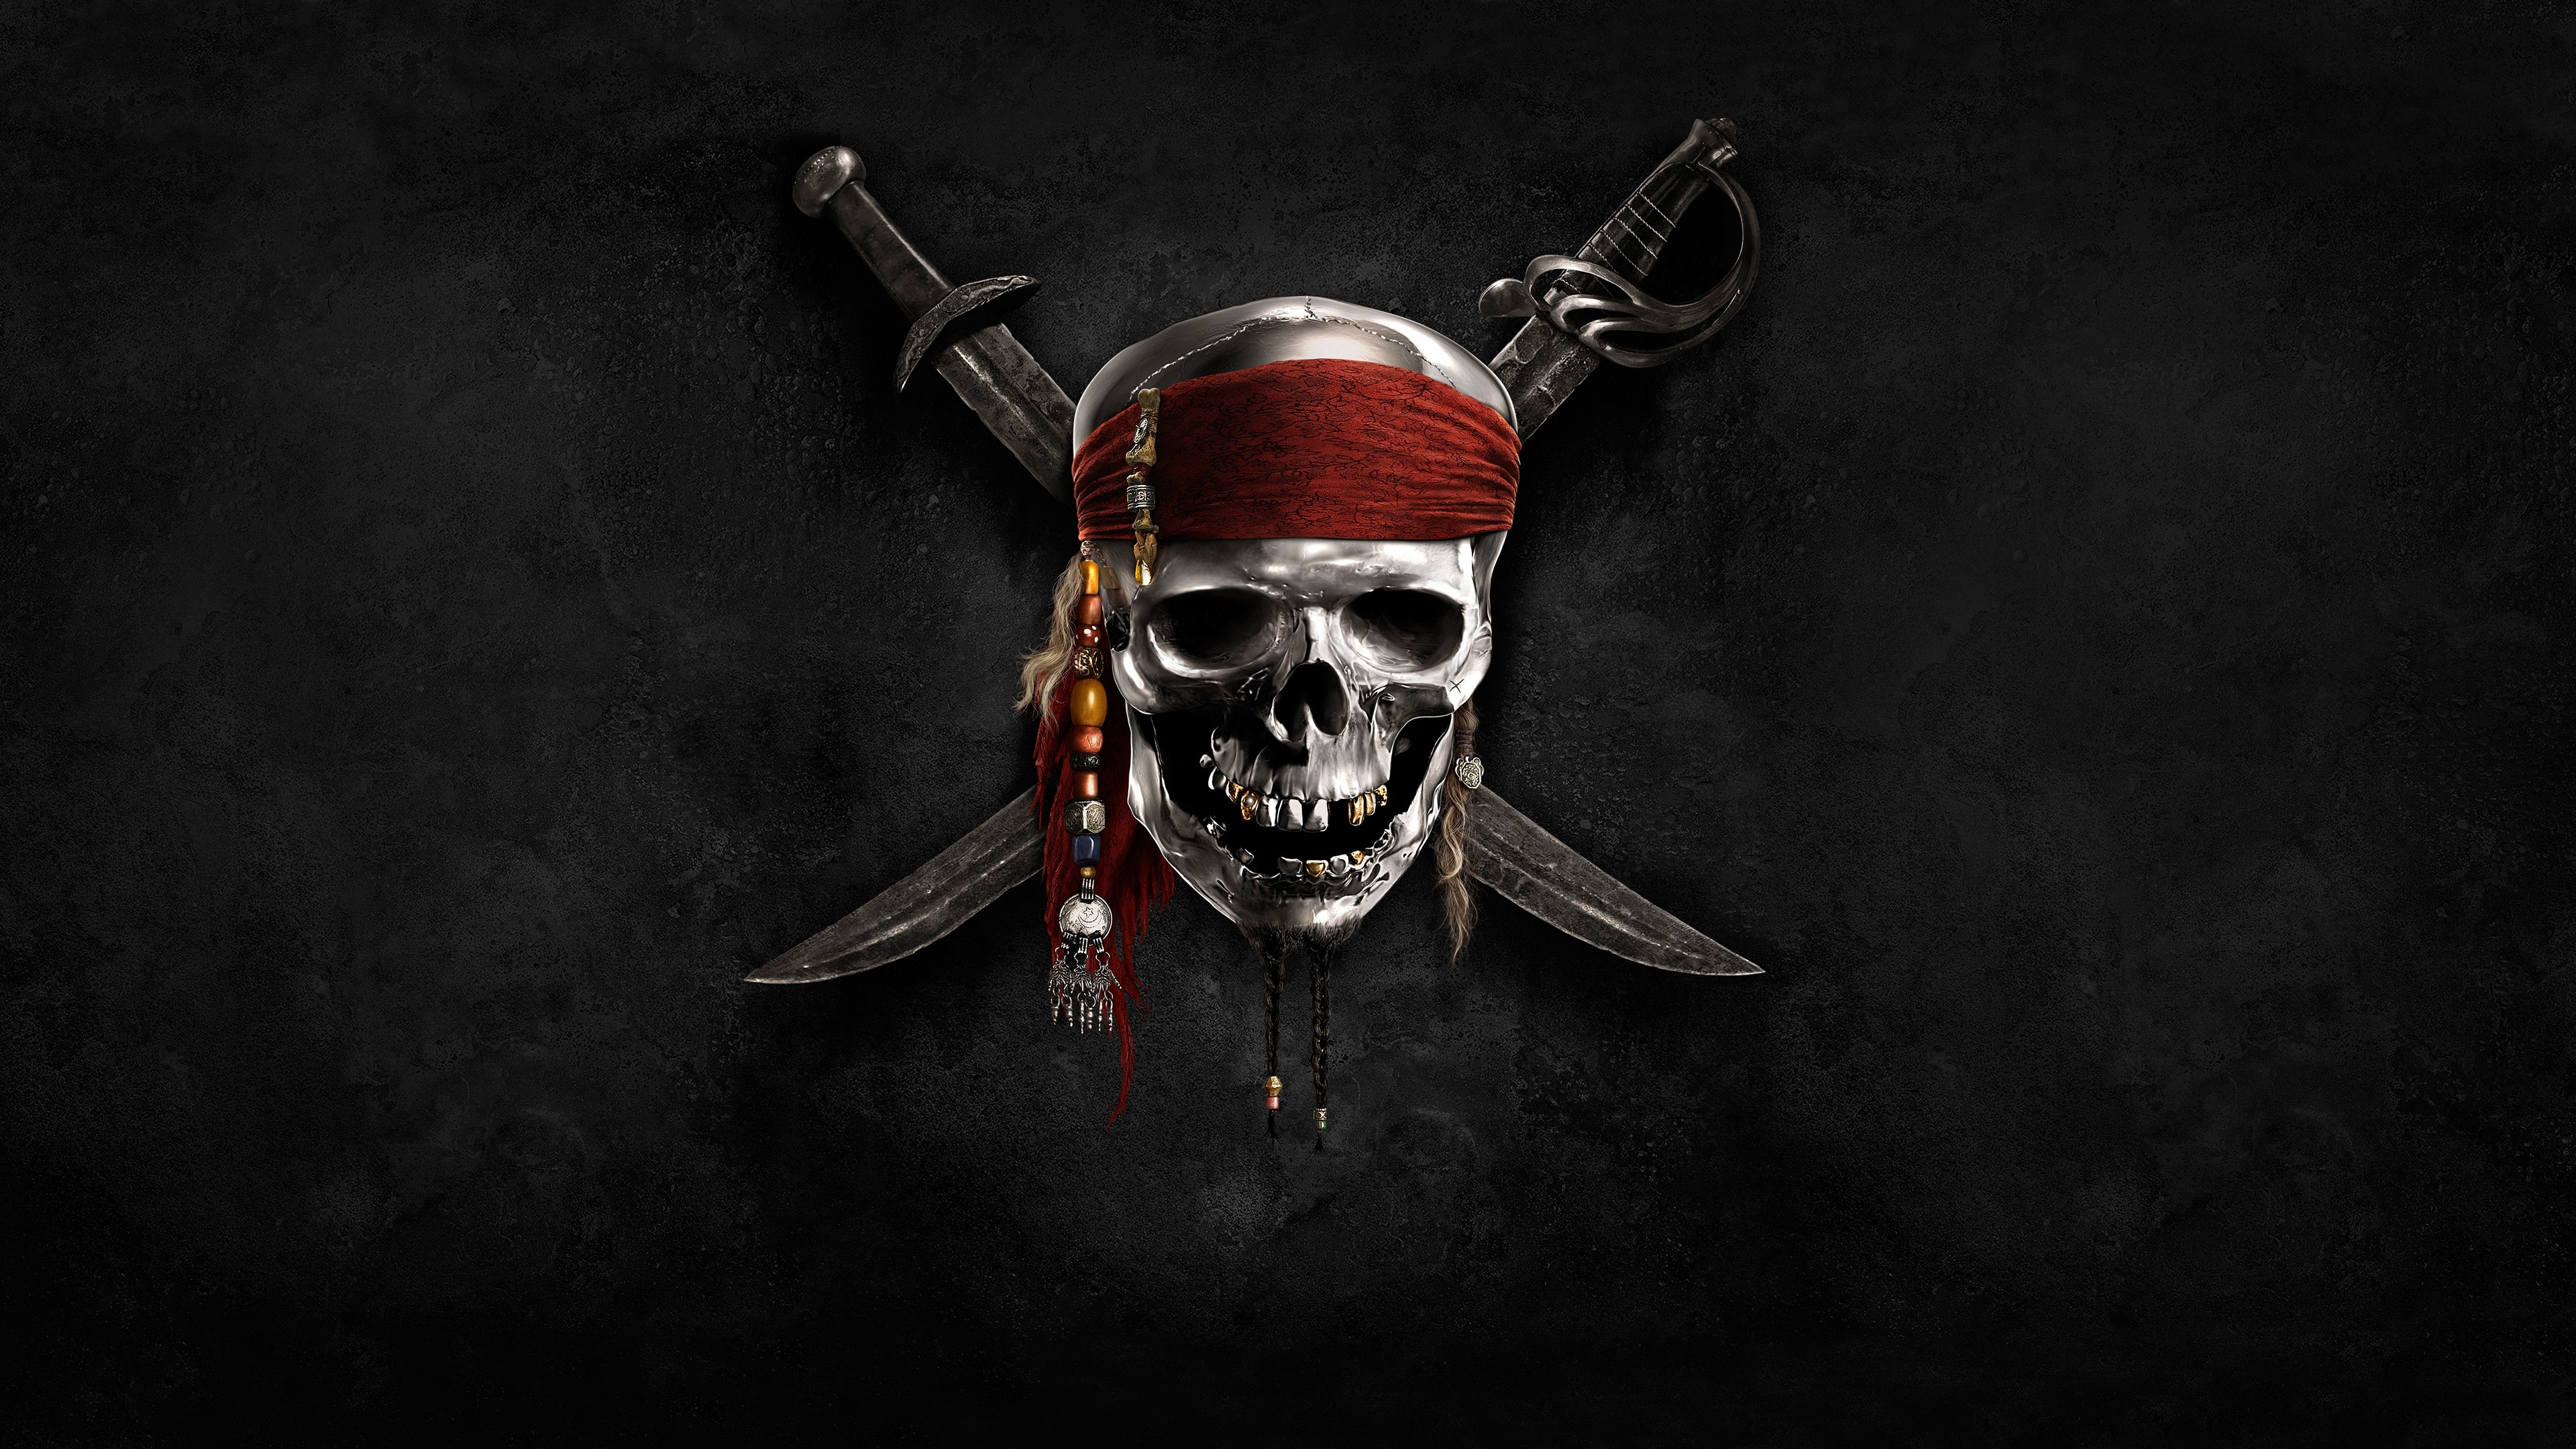 pirate 4k 1540748375 - Pirate 4k - pirate wallpapers, logo wallpapers, digital art wallpapers, artist wallpapers